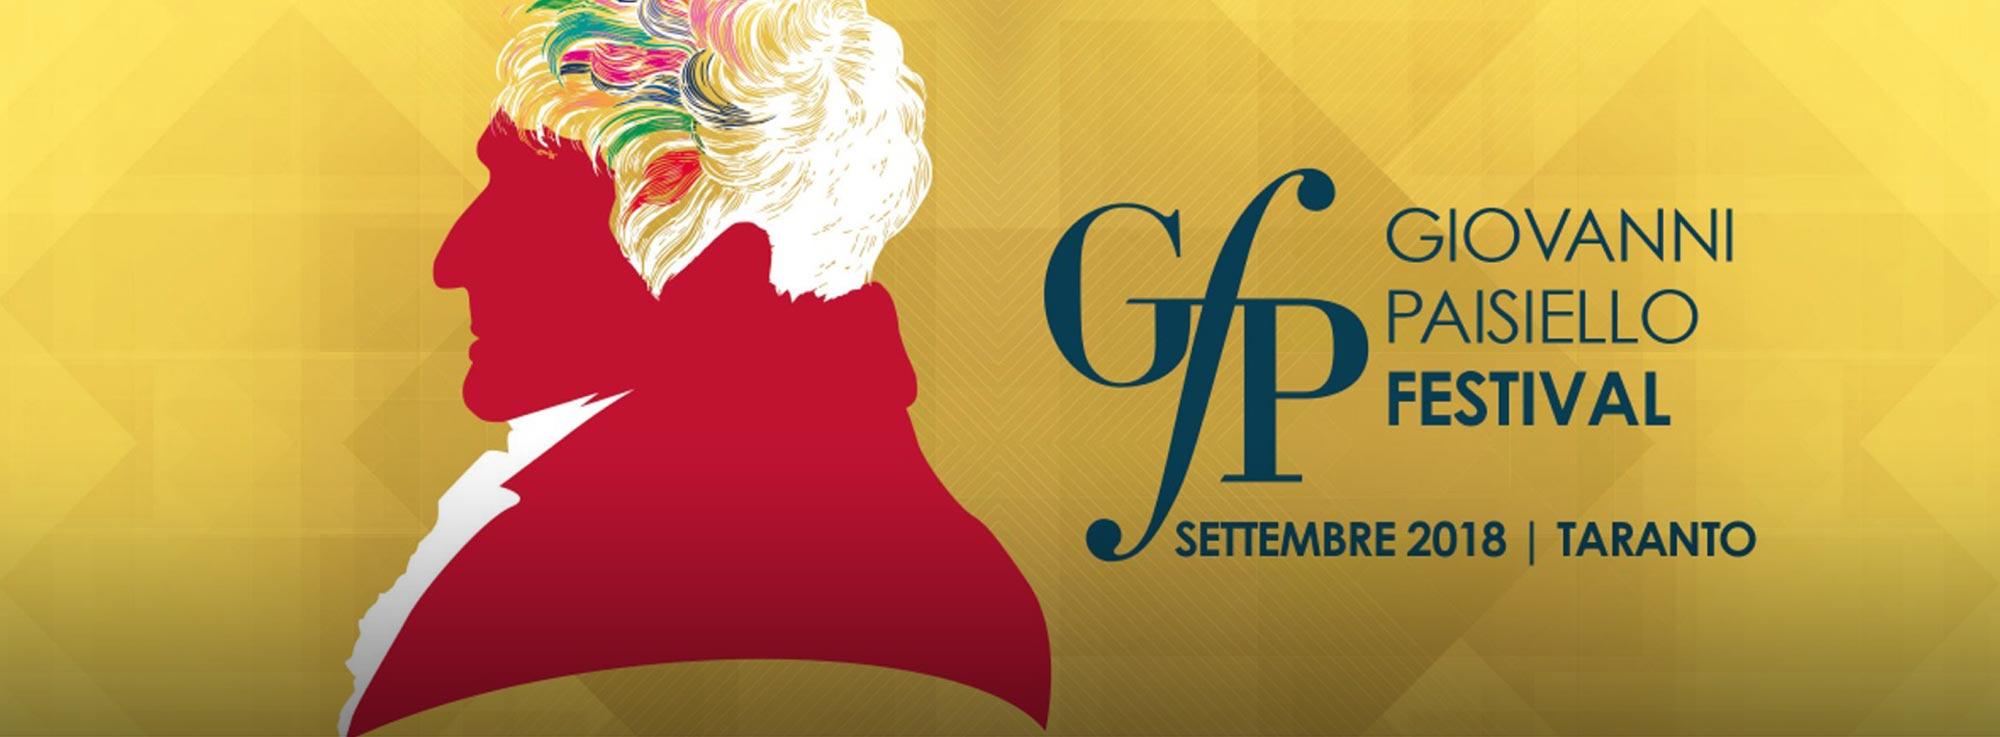 Taranto: Giovanni Paisiello Festival